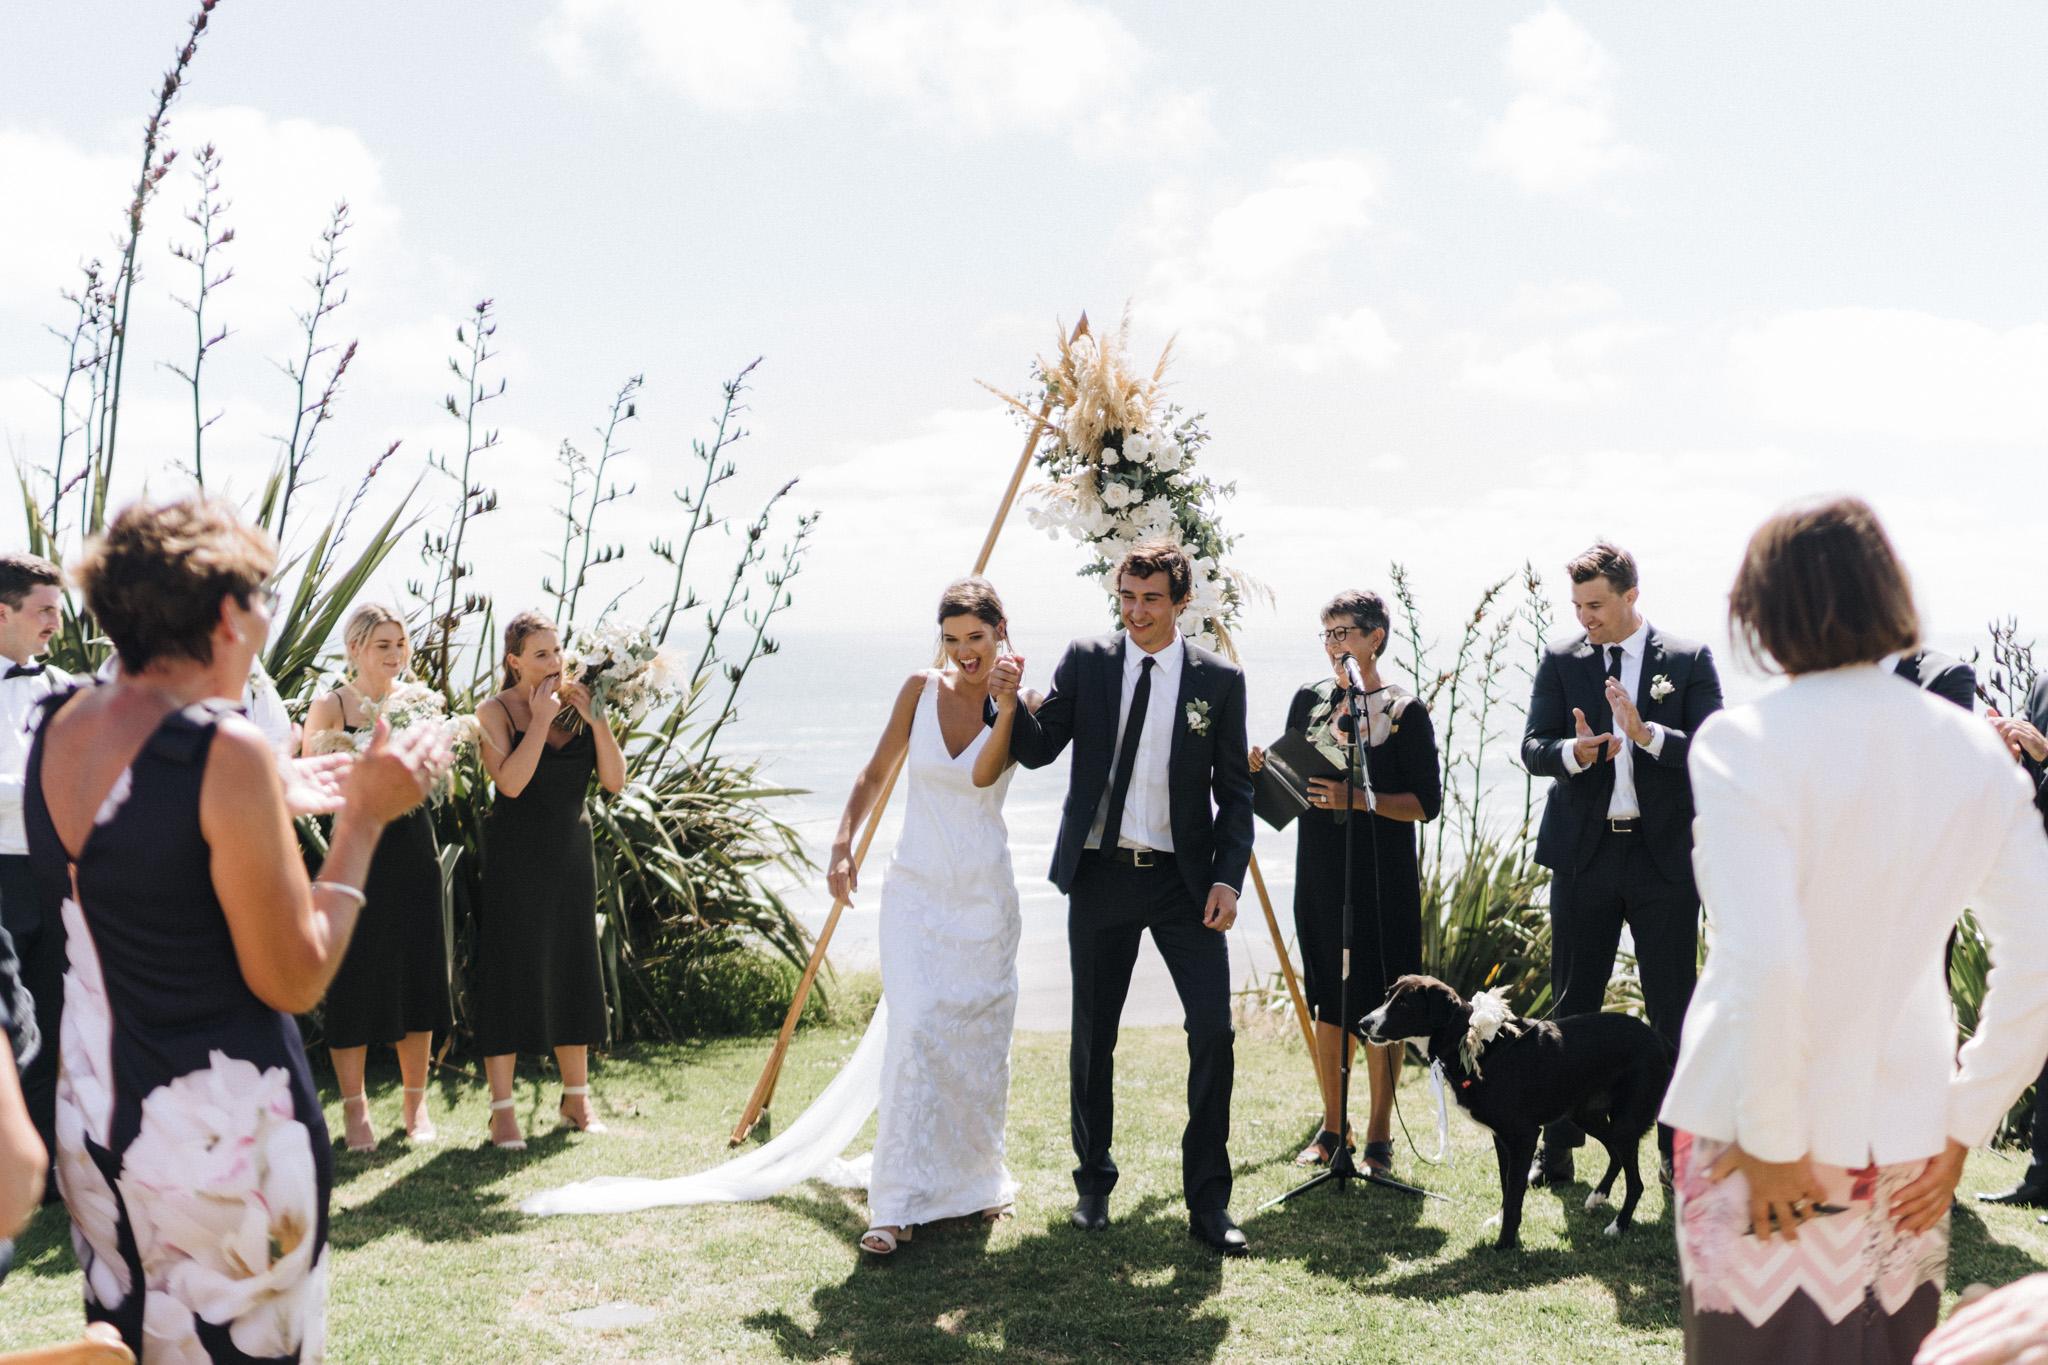 newfound-h-m-castaways-waiuku-auckland-wedding-photographer-126